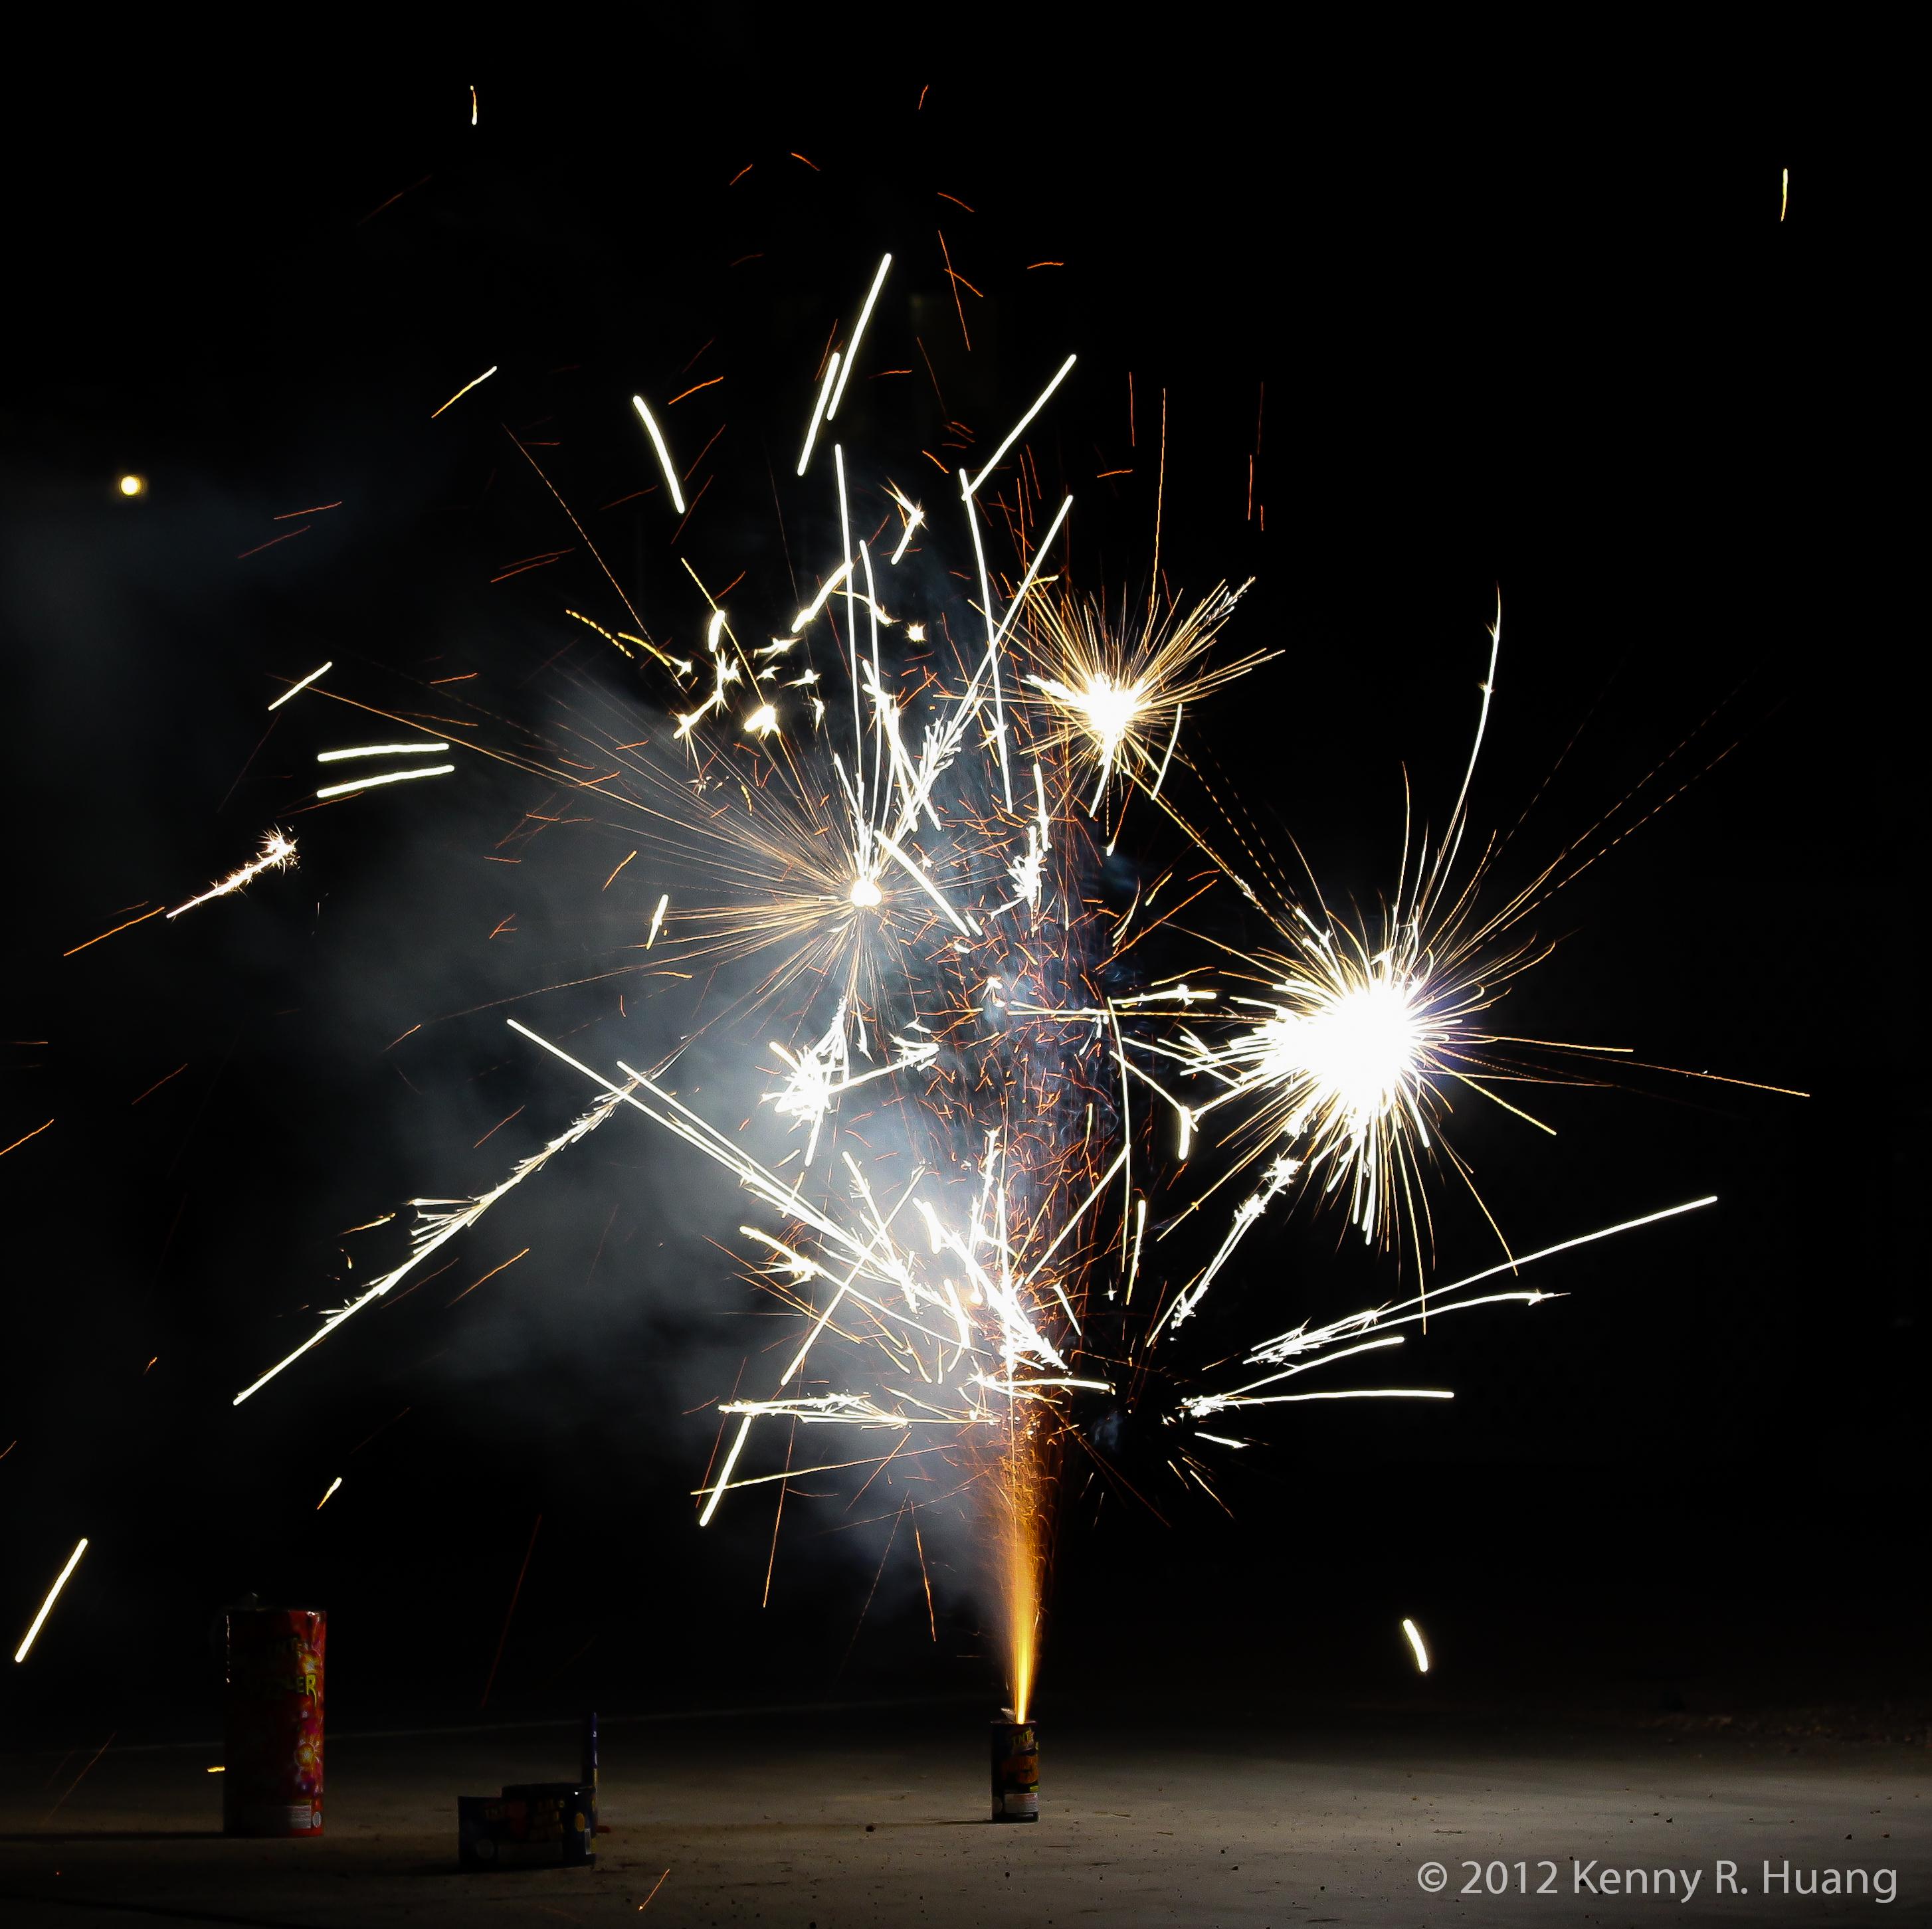 2012-kenny-r-huang-8664